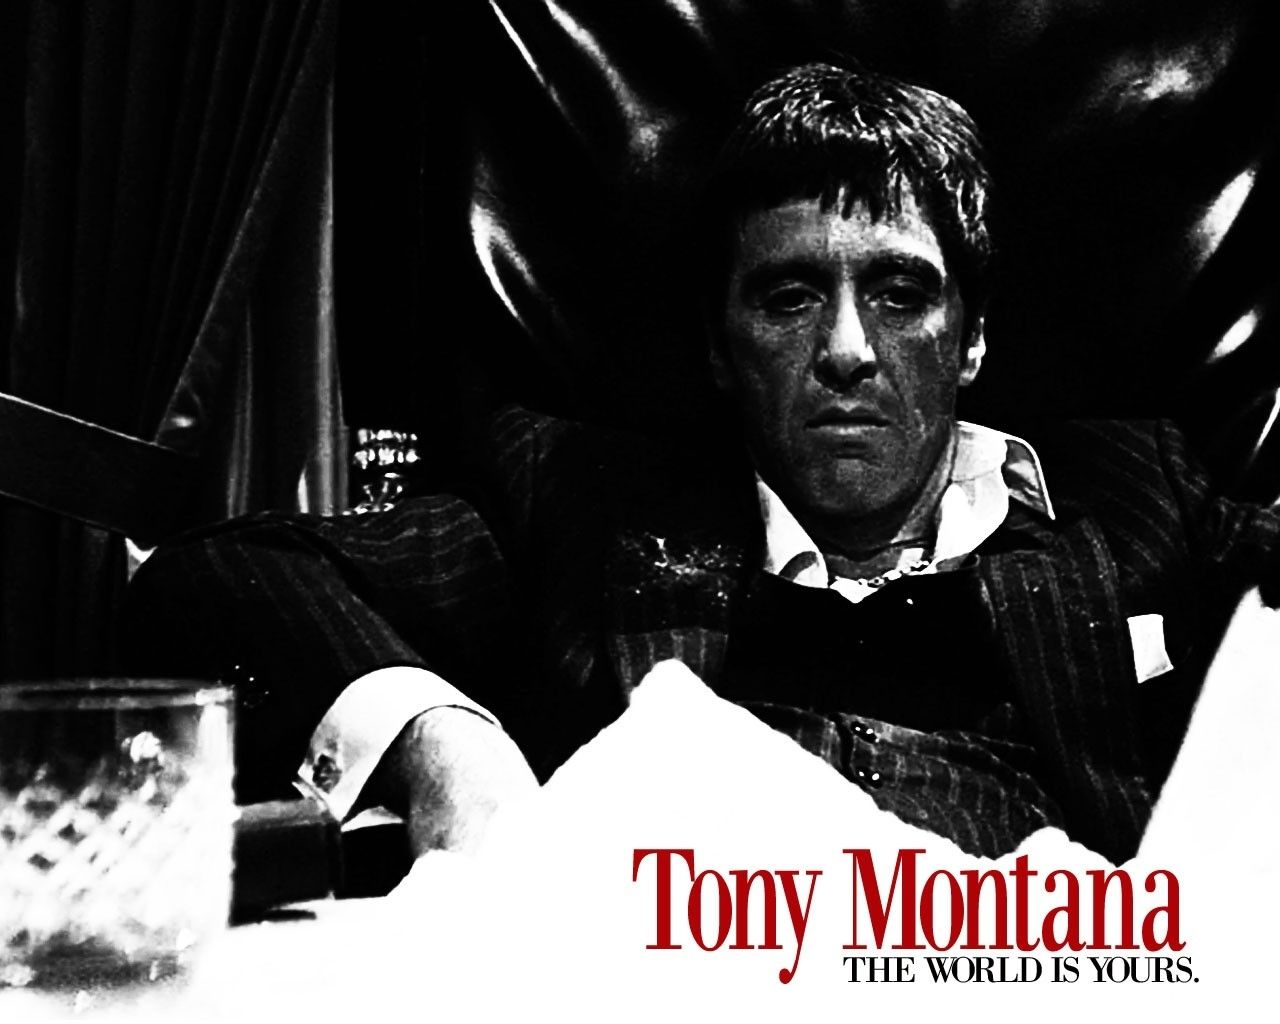 Tony Montana Scarface Wallpaper Wallpapers Heroes